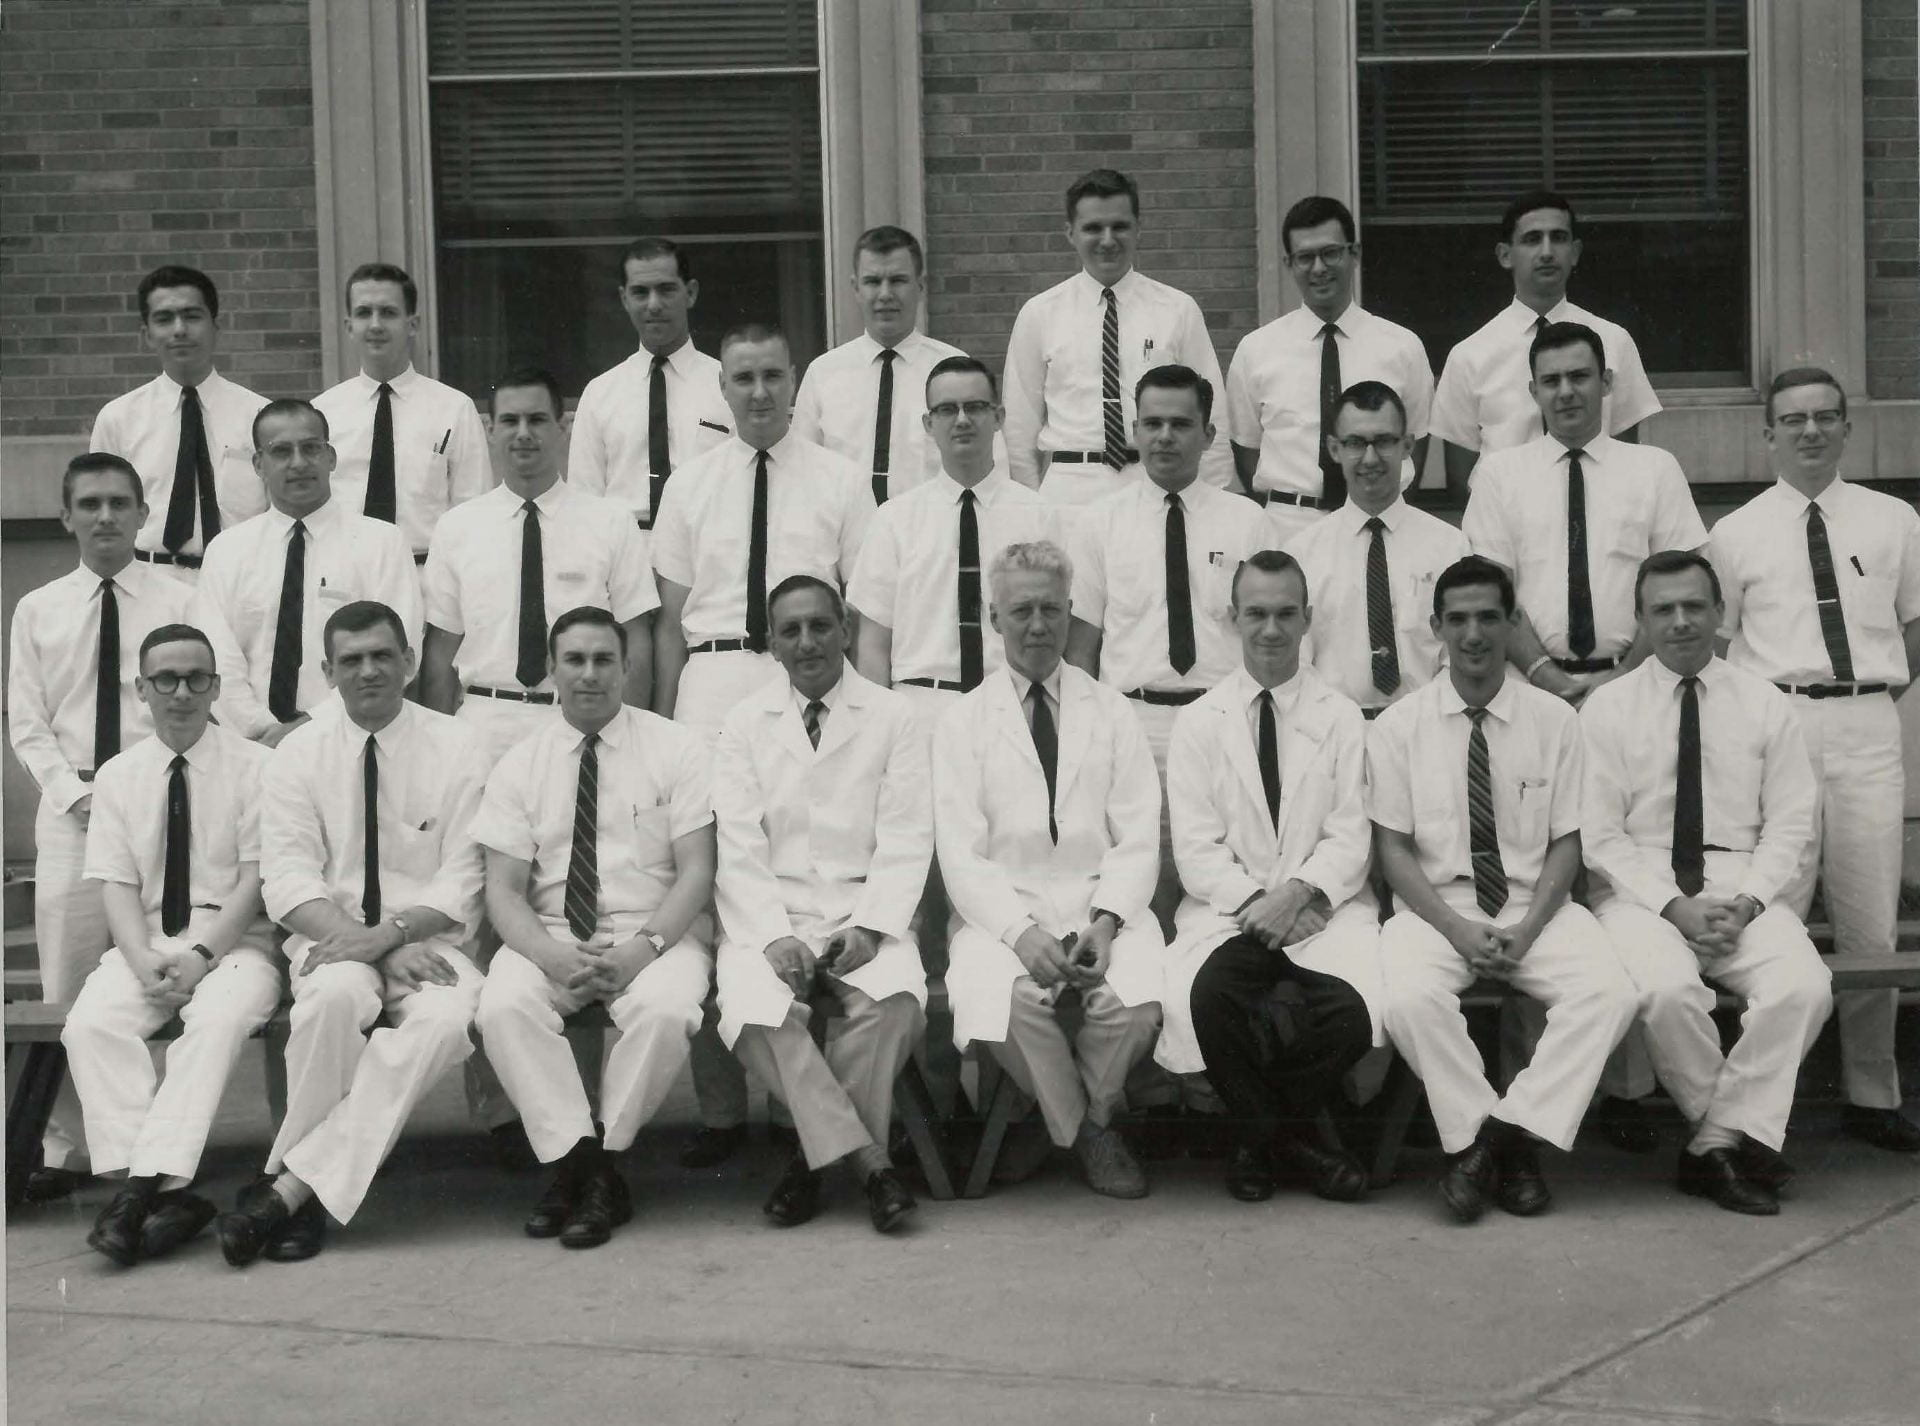 1961 Housestaff Photo (2)